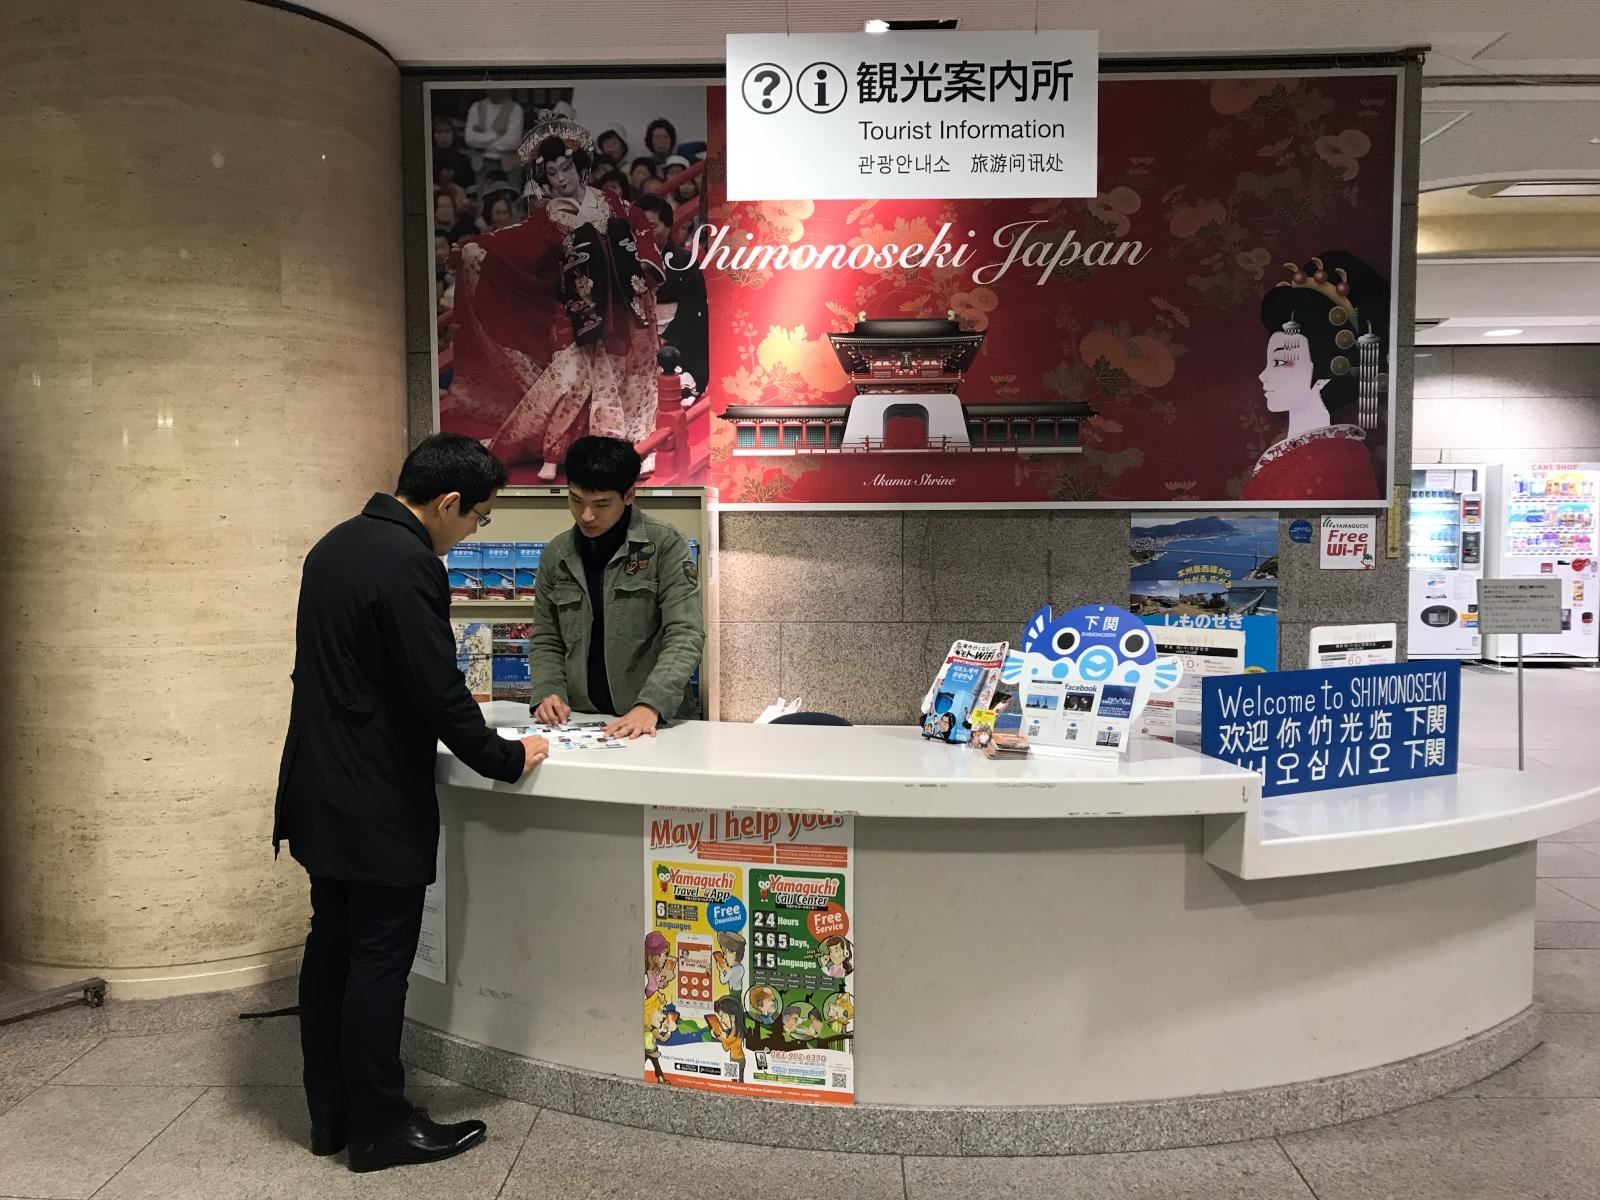 1. Shimonoseki International Terminal Sightseeing Information Centre